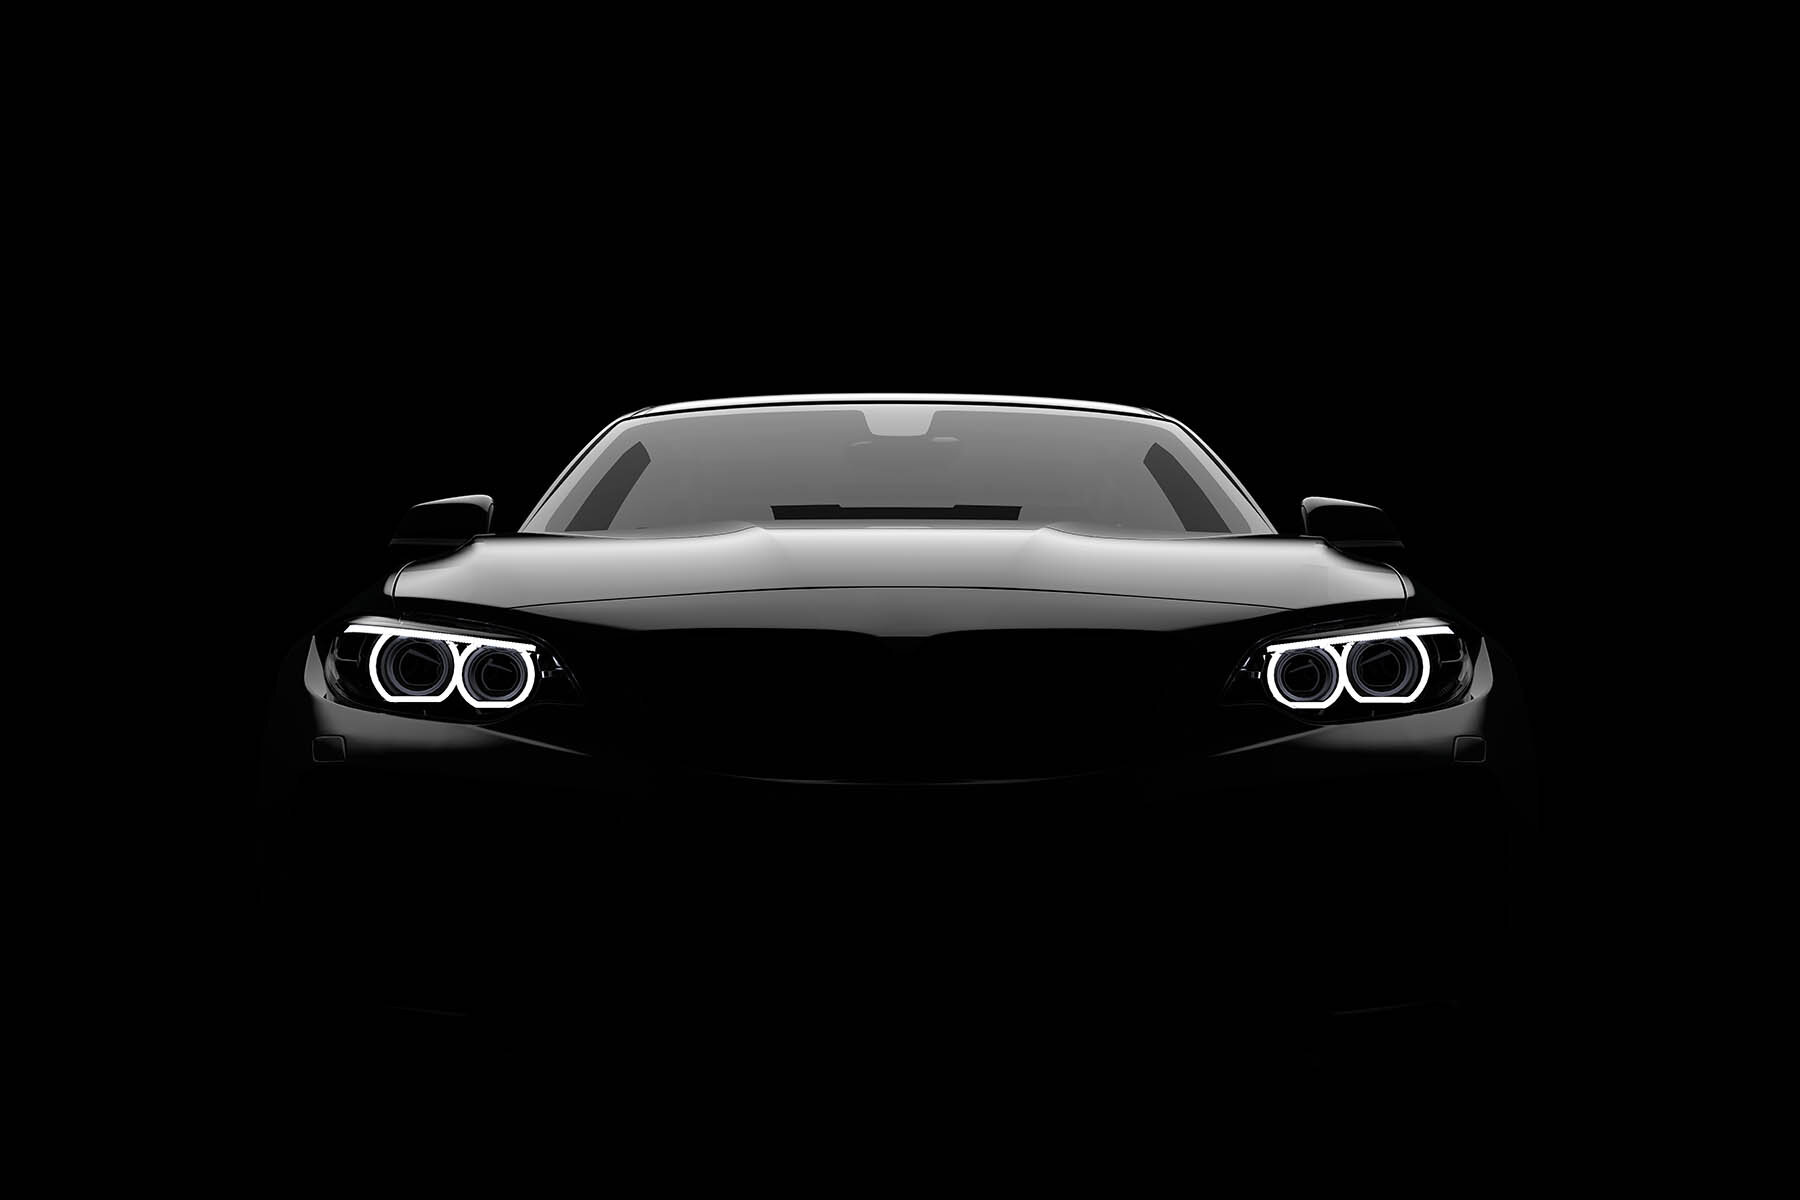 PlateART Duschrückwand mit Motiv Auto